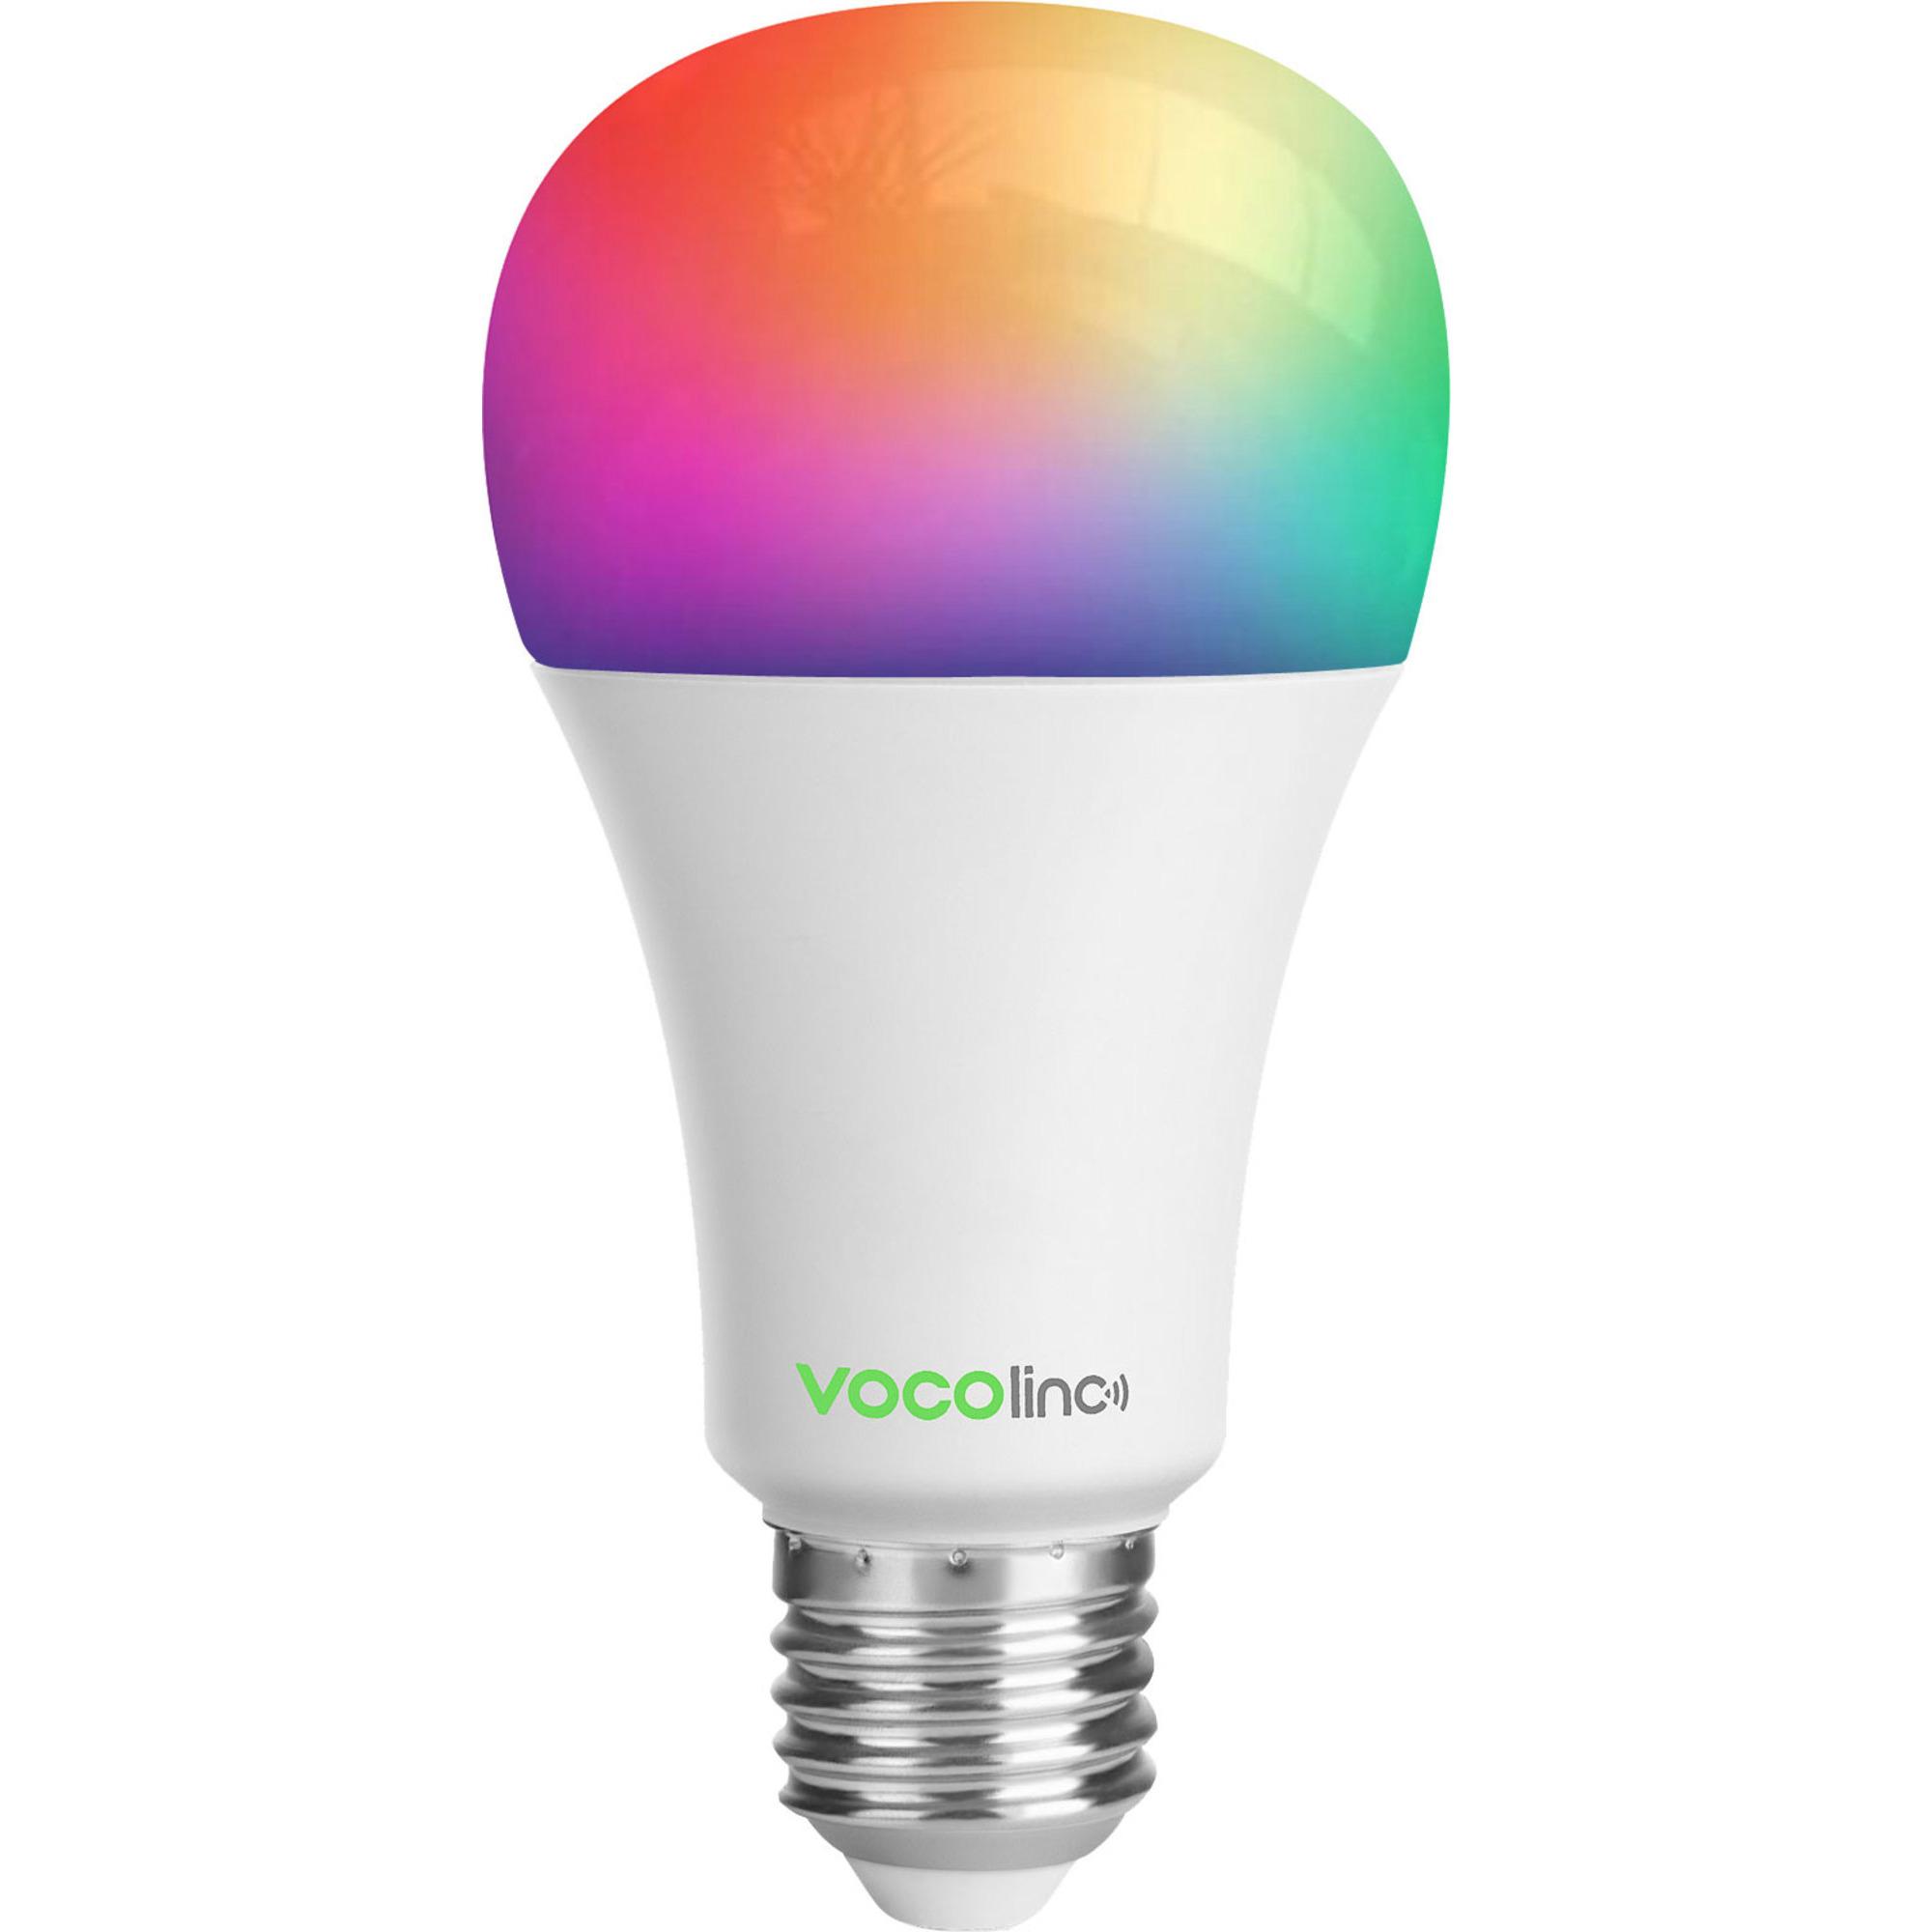 VOCOlinc Smart WiFi Glödlampa (E27) 65W Färg